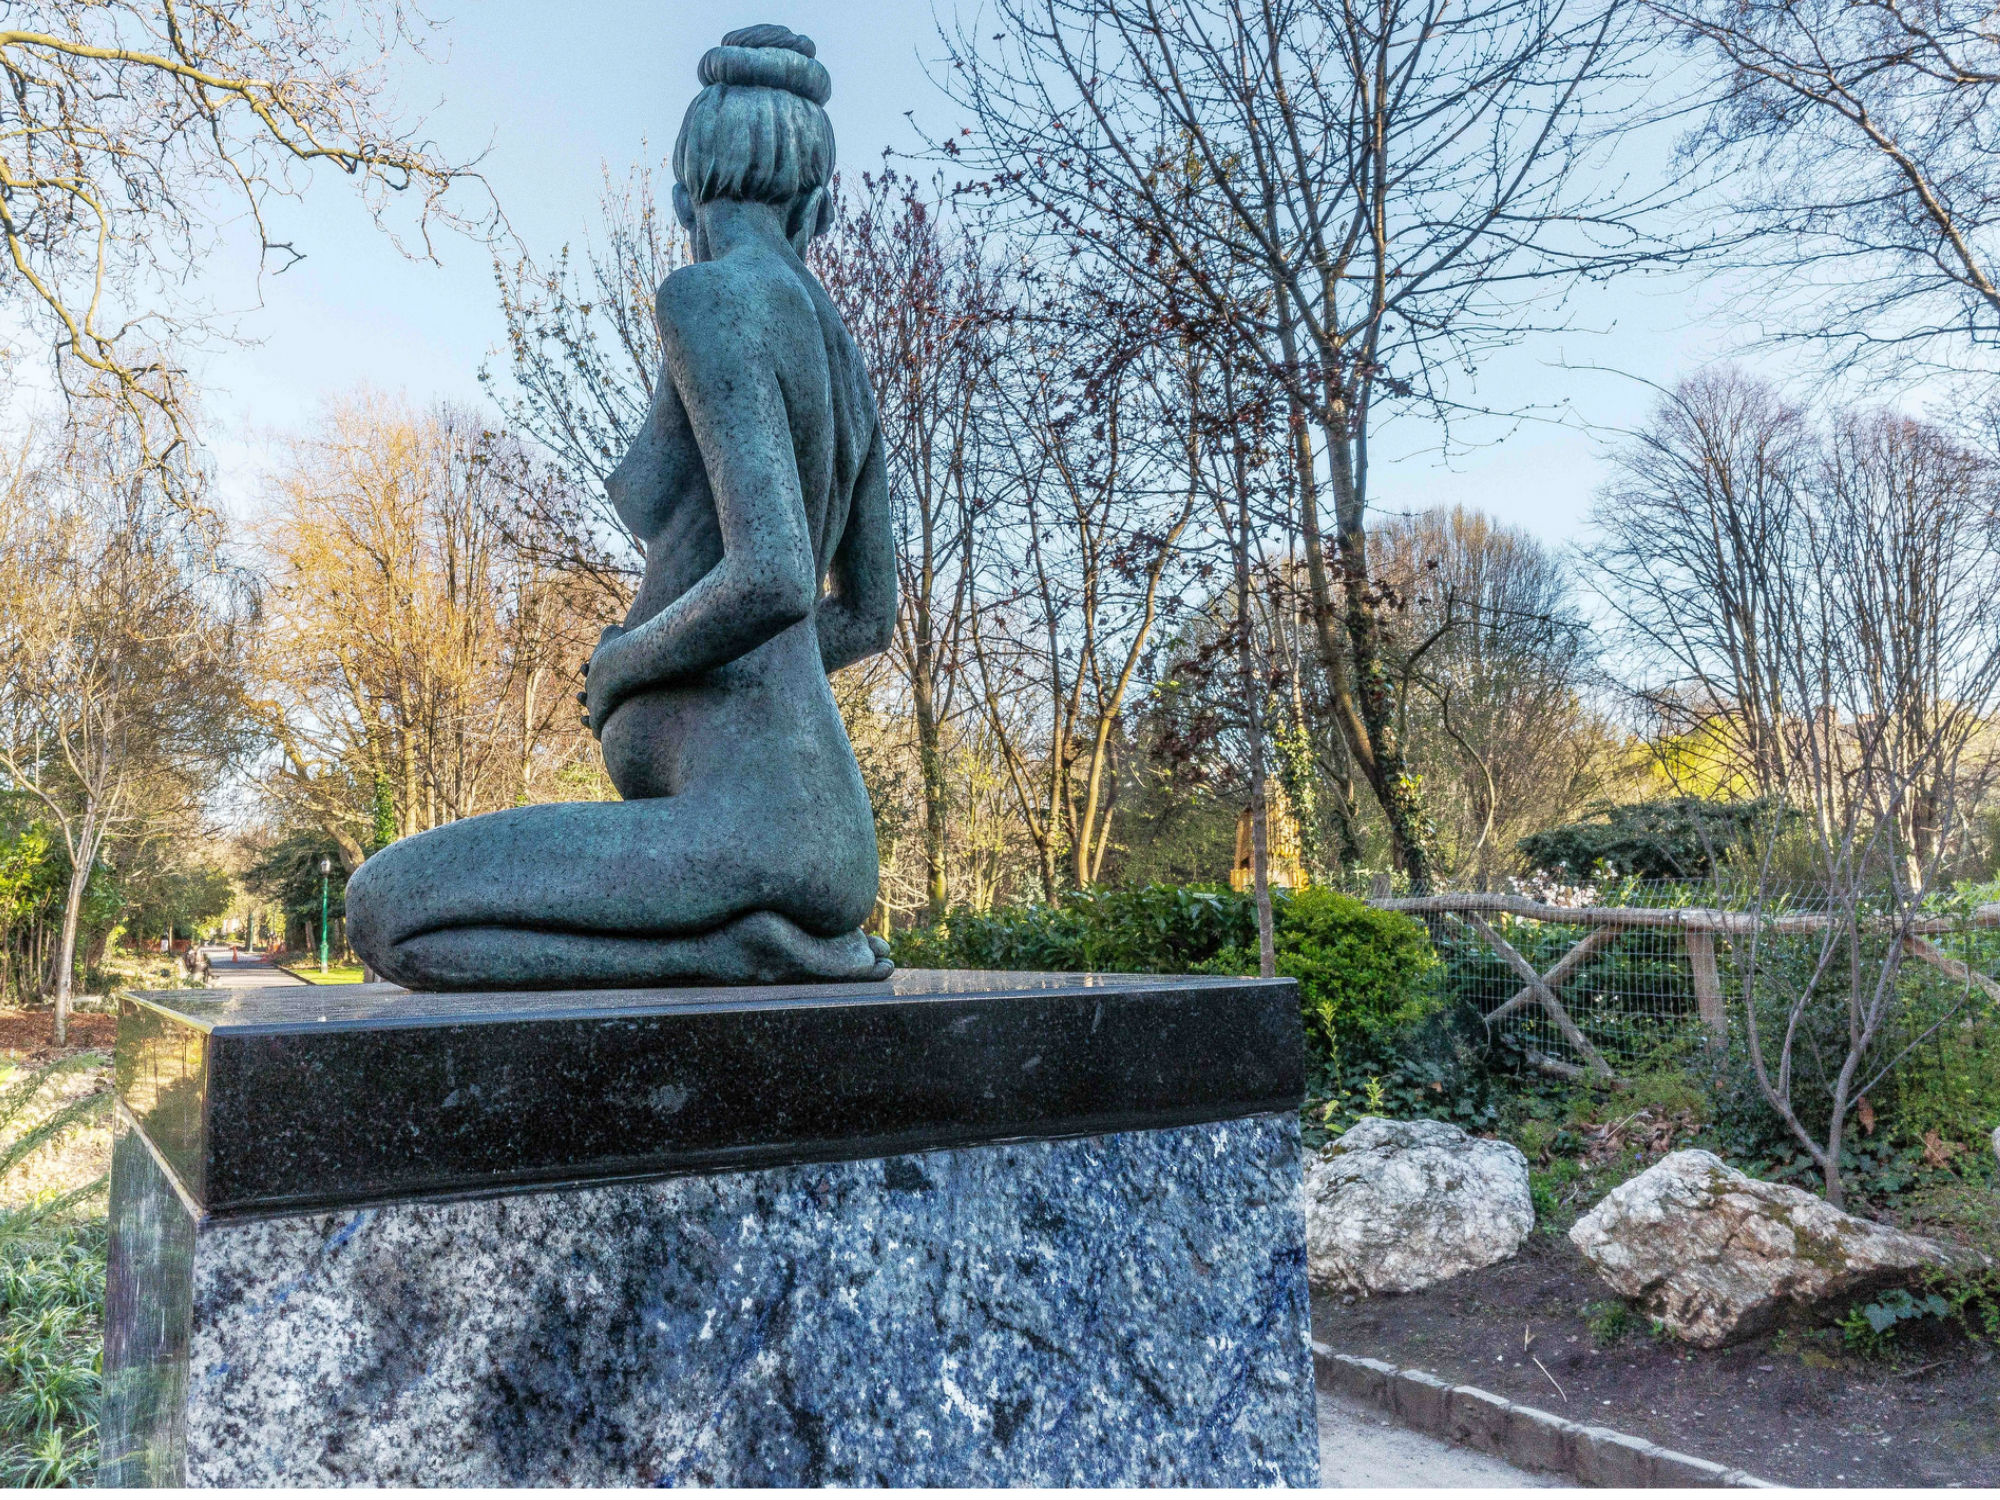 statue of oscar wilde's pregnant wife merrion square in dublin